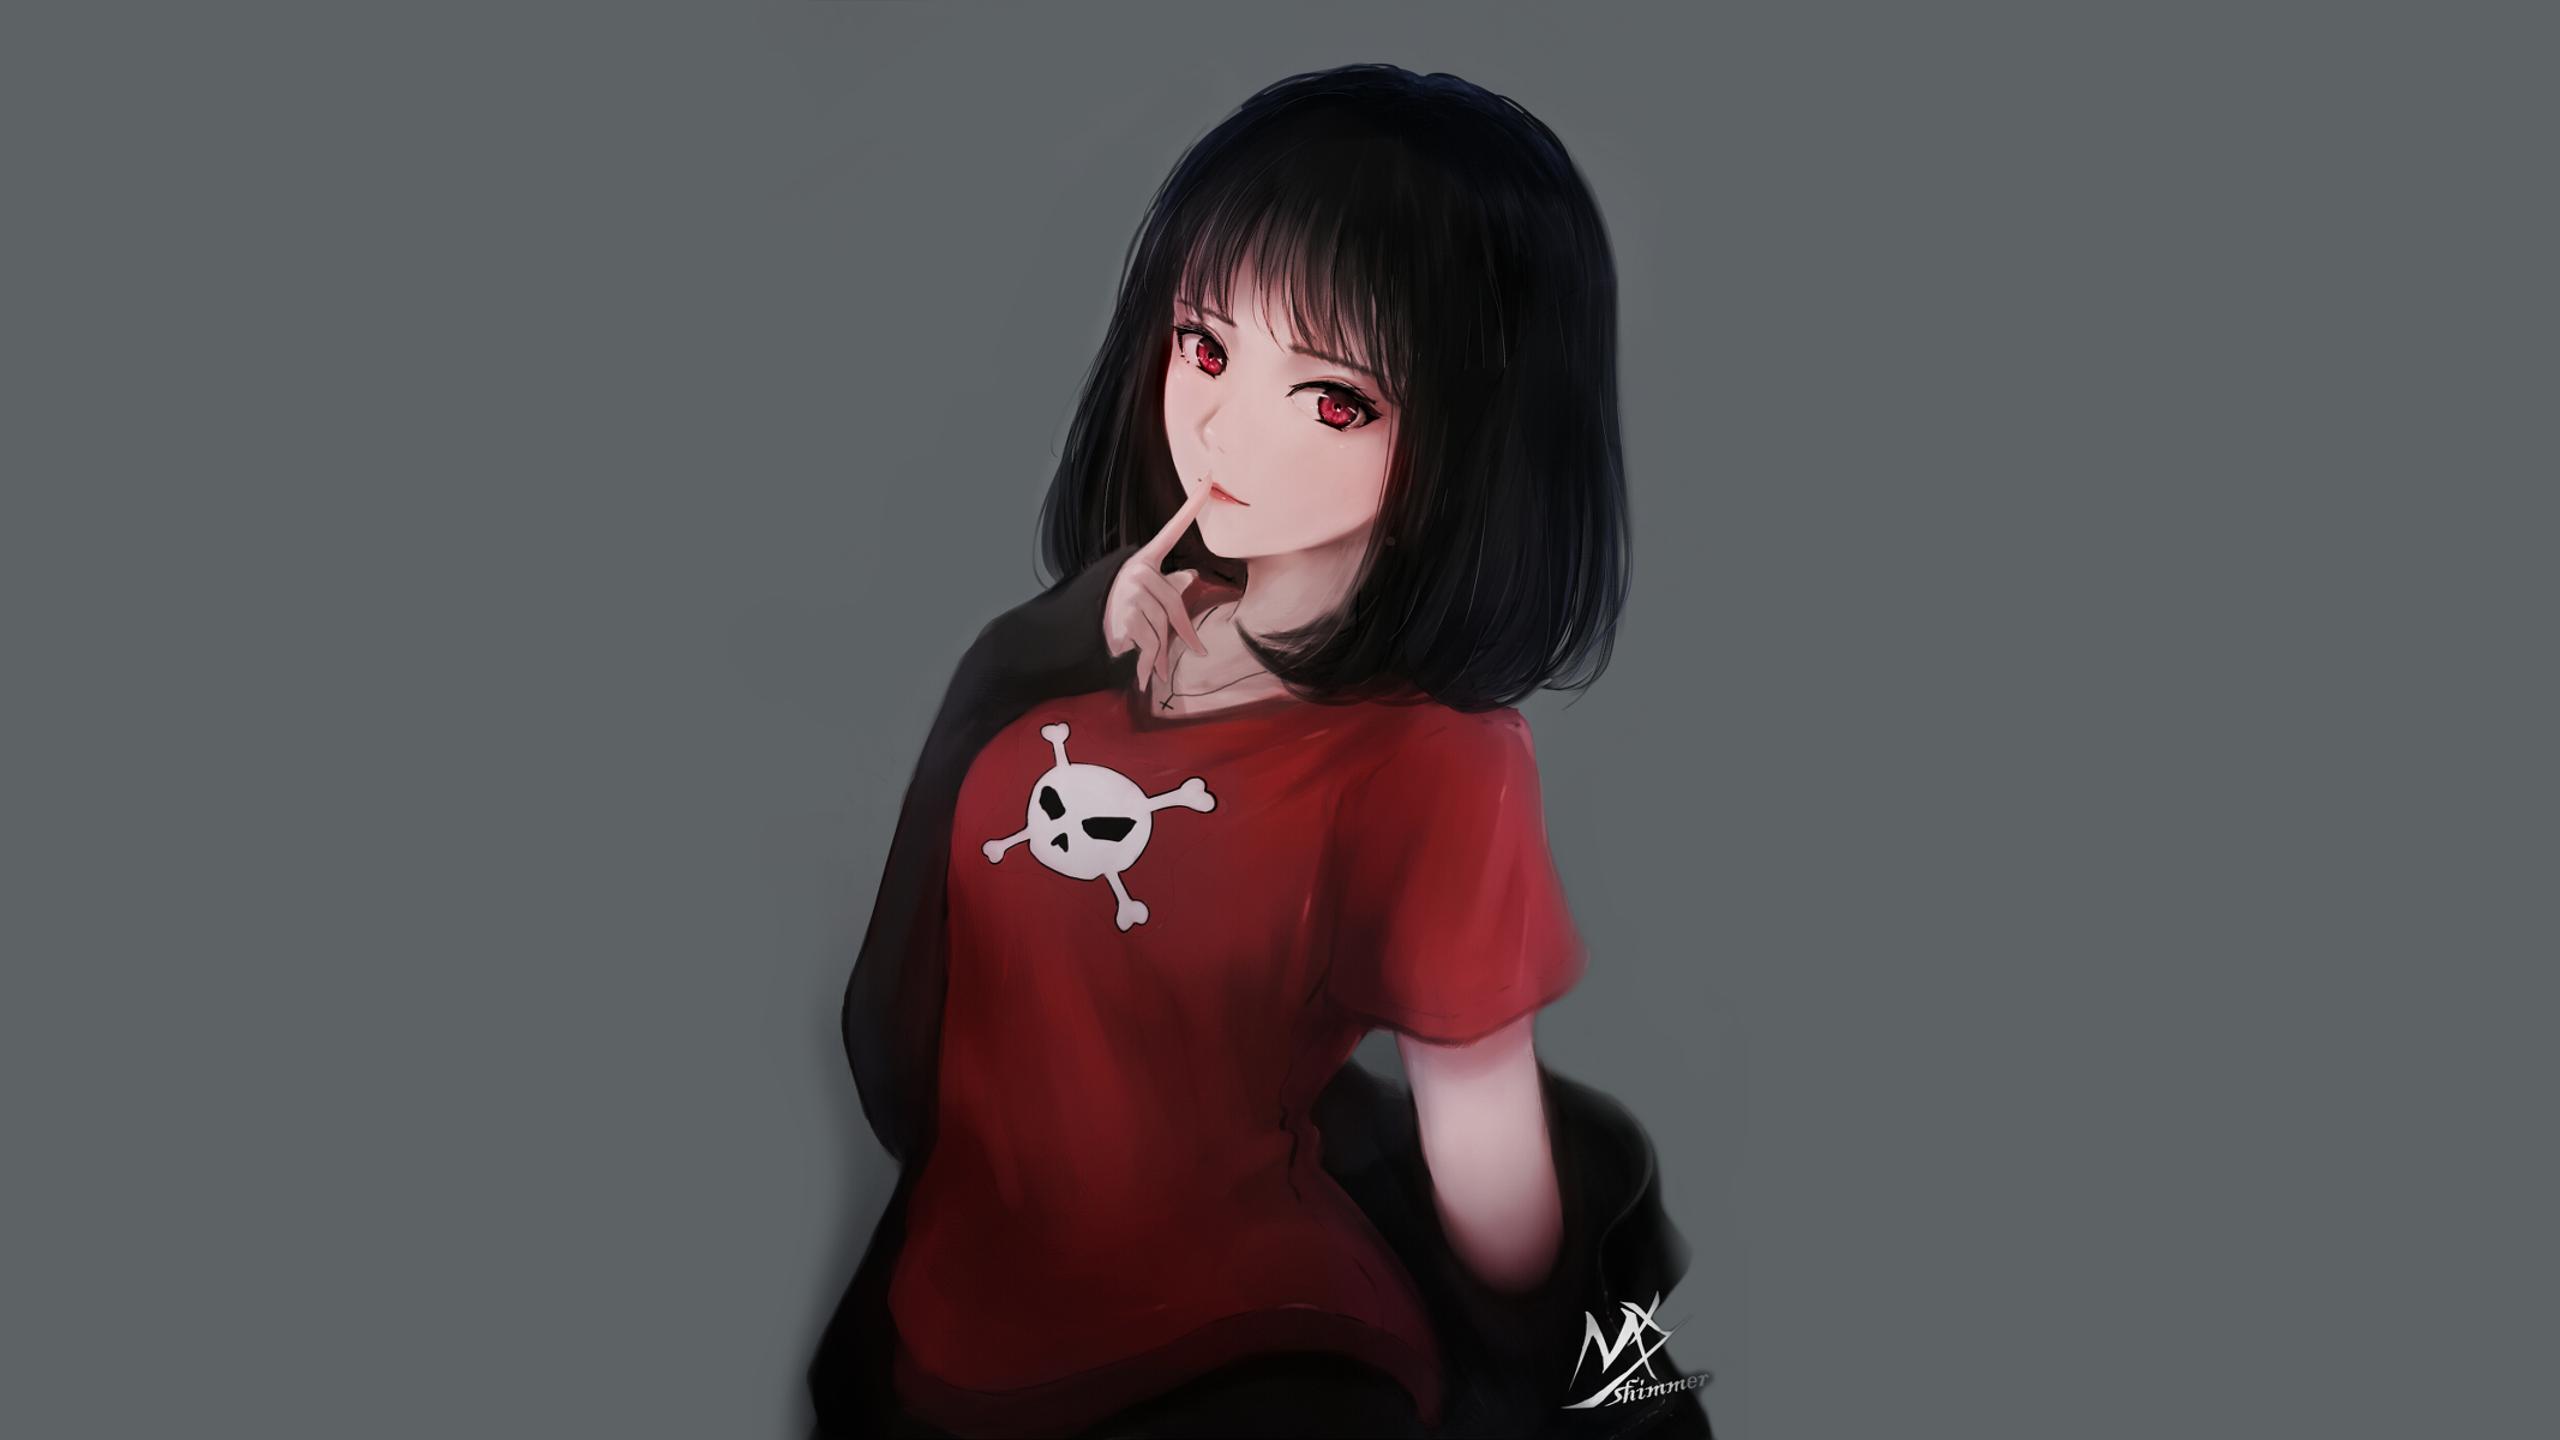 Anime Girl Hd Wallpaper Background Image 2560x1440 Id